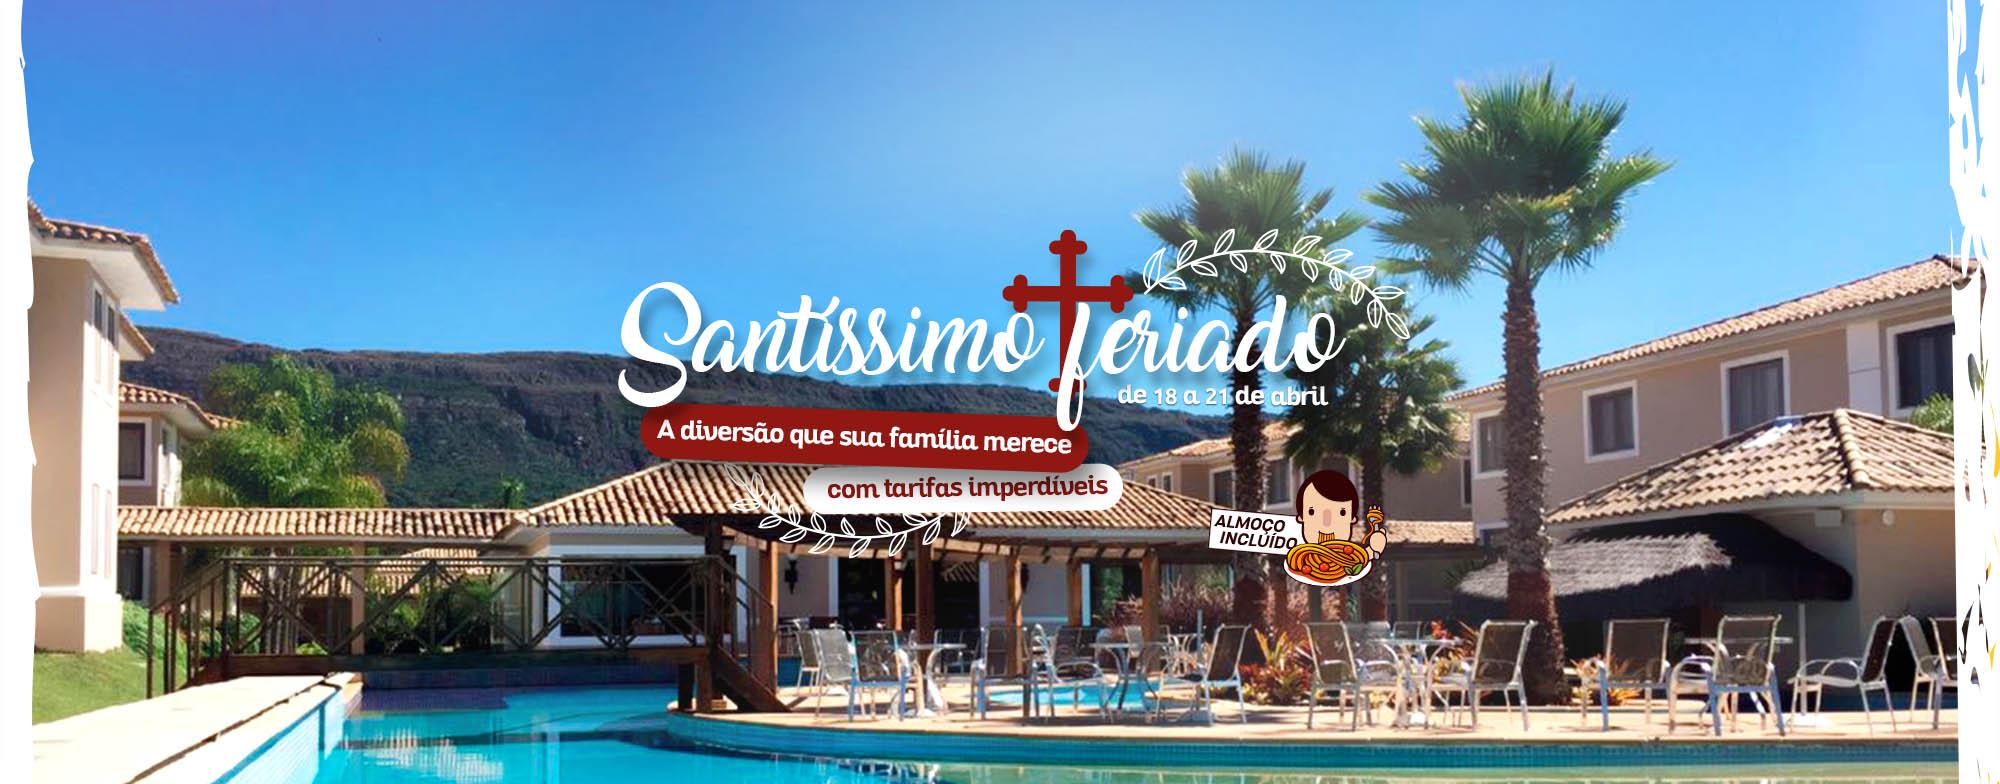 santissimo_facebook_site_semana_santa_2019